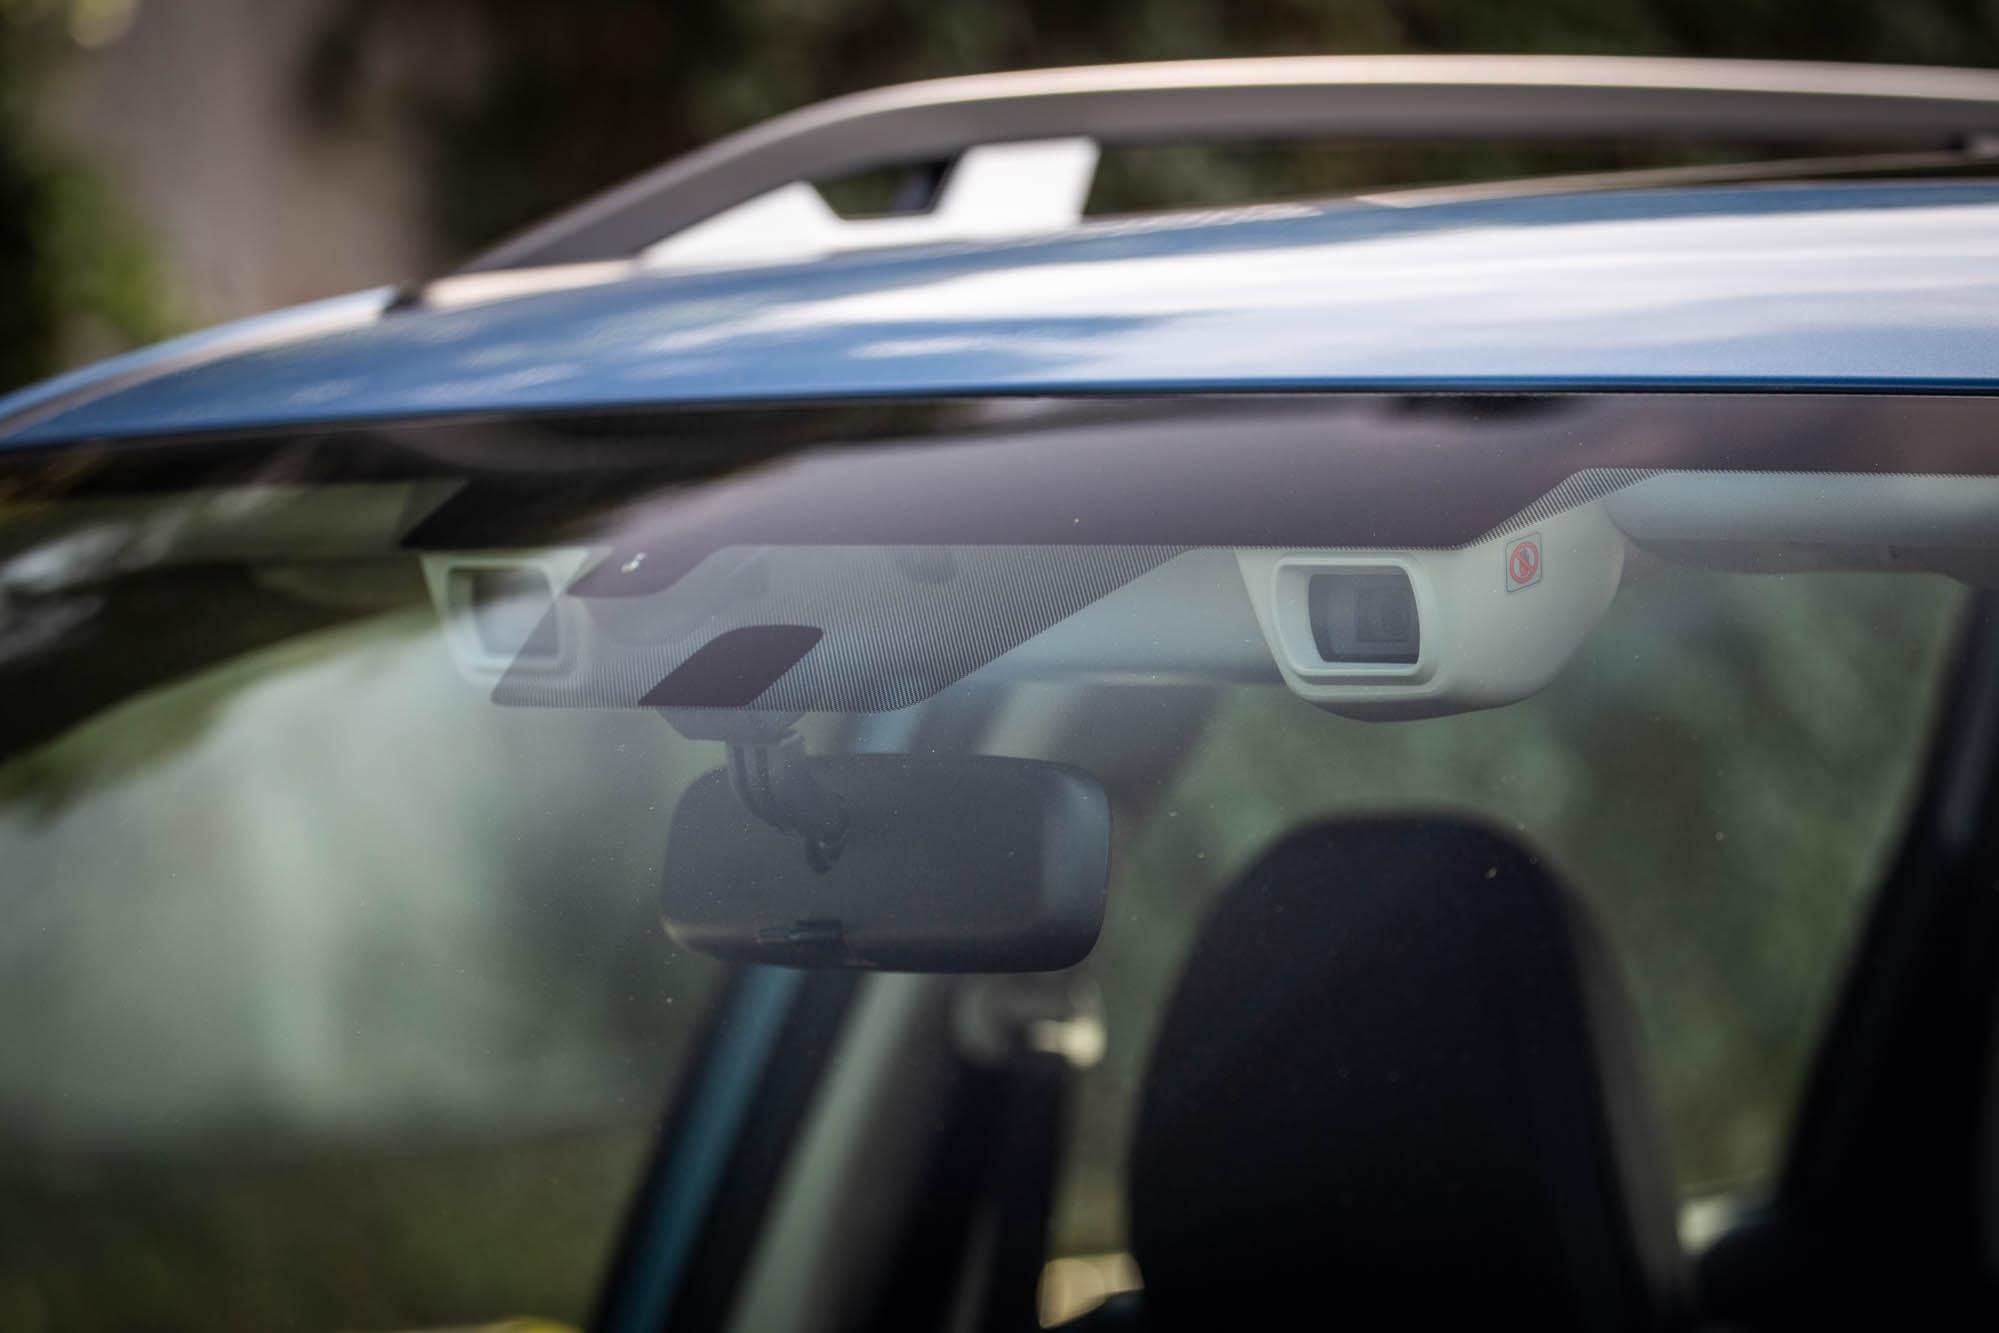 EyeSight智能駕駛安全輔助系統是透過前擋風玻璃內側兩個立體攝影鏡頭擷取三維彩色影像,與其他車款科技特色有所不同